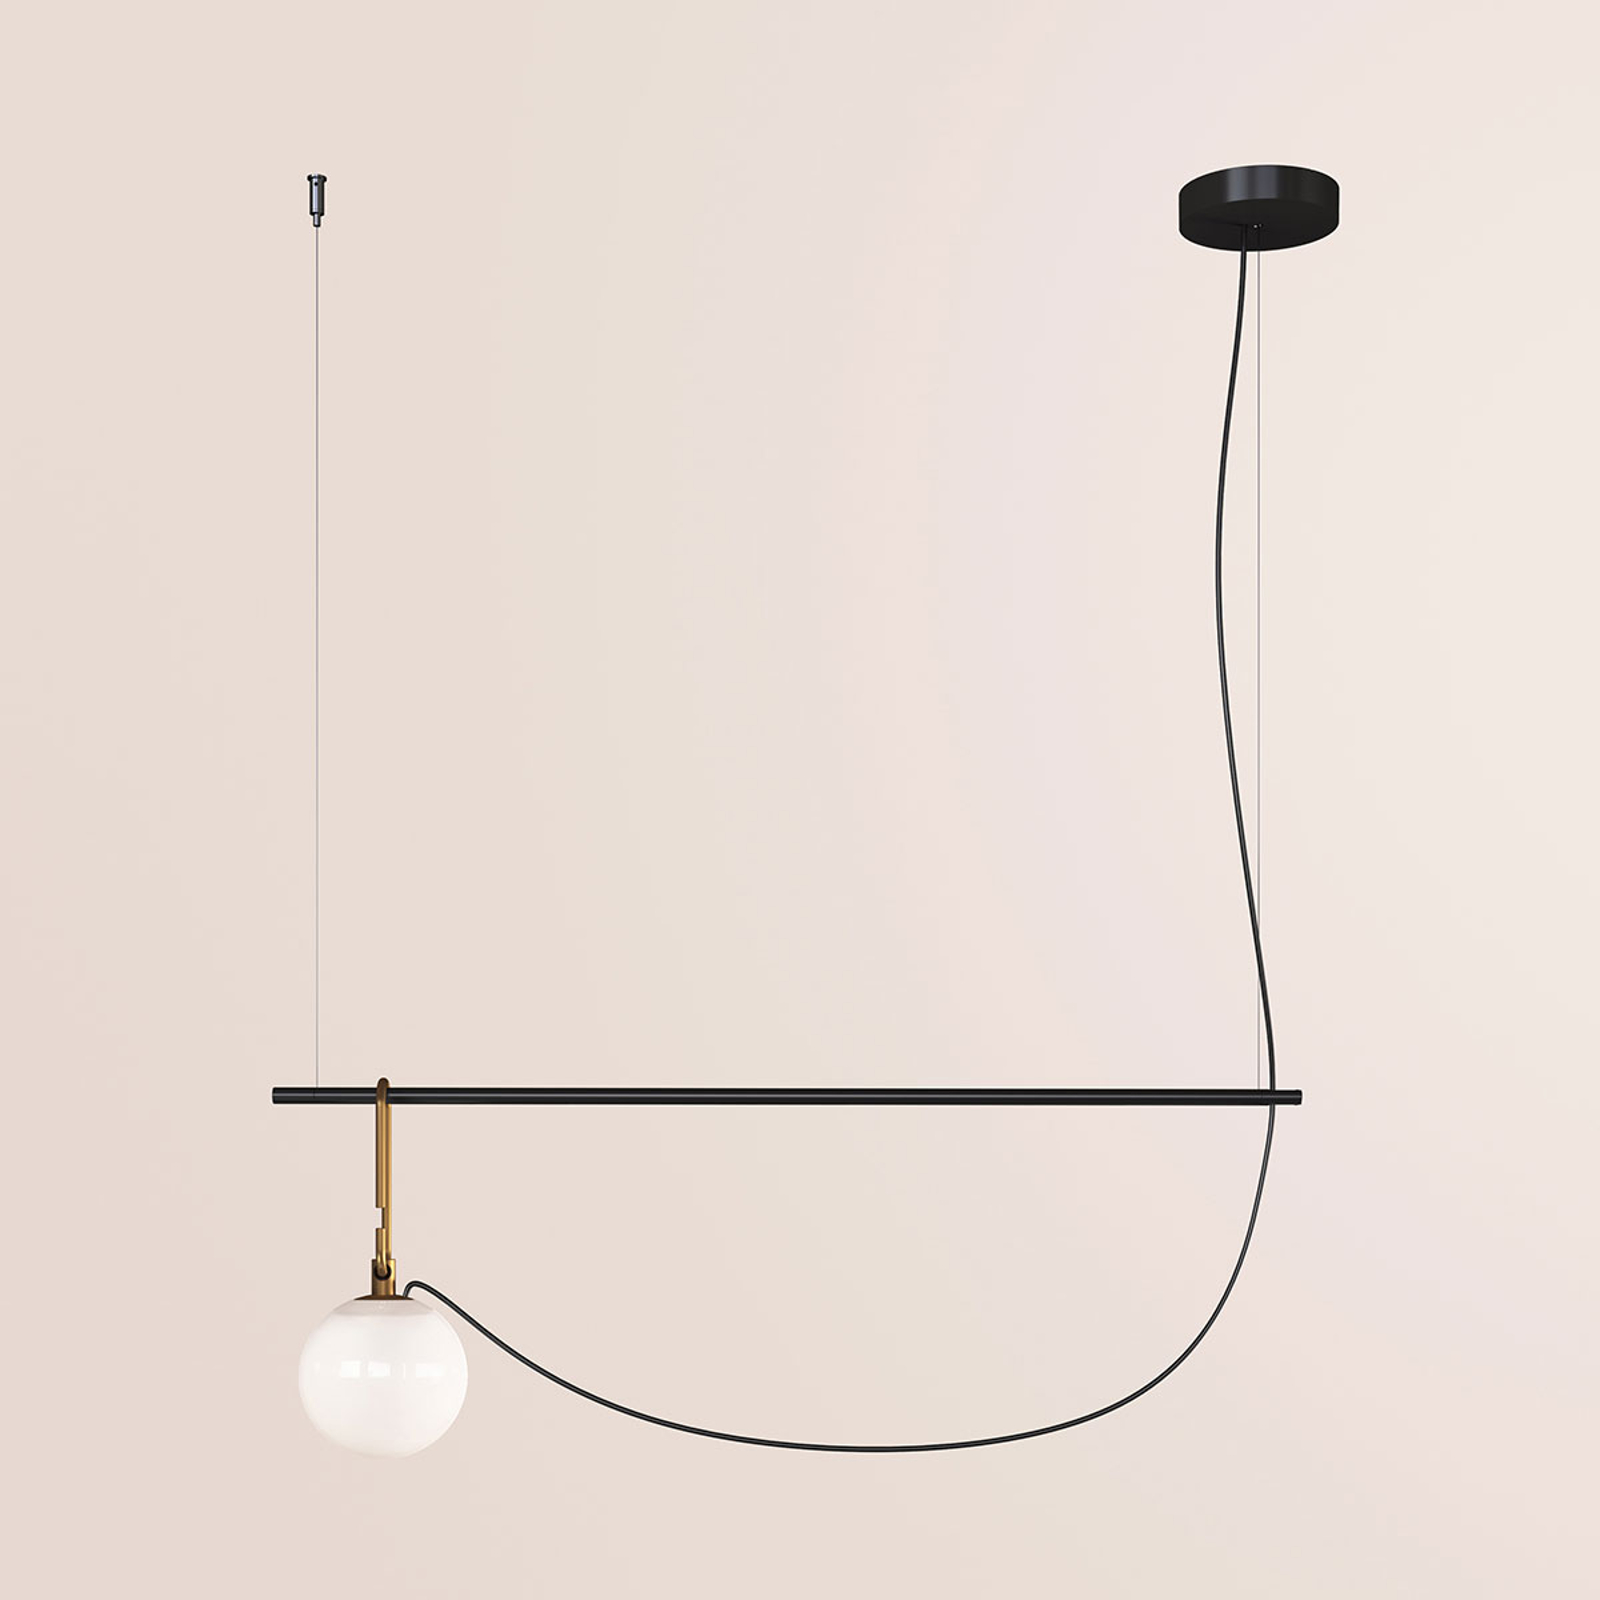 Artemide nh S2 14 lampa wisząca 90,5 cm kula Ø14cm